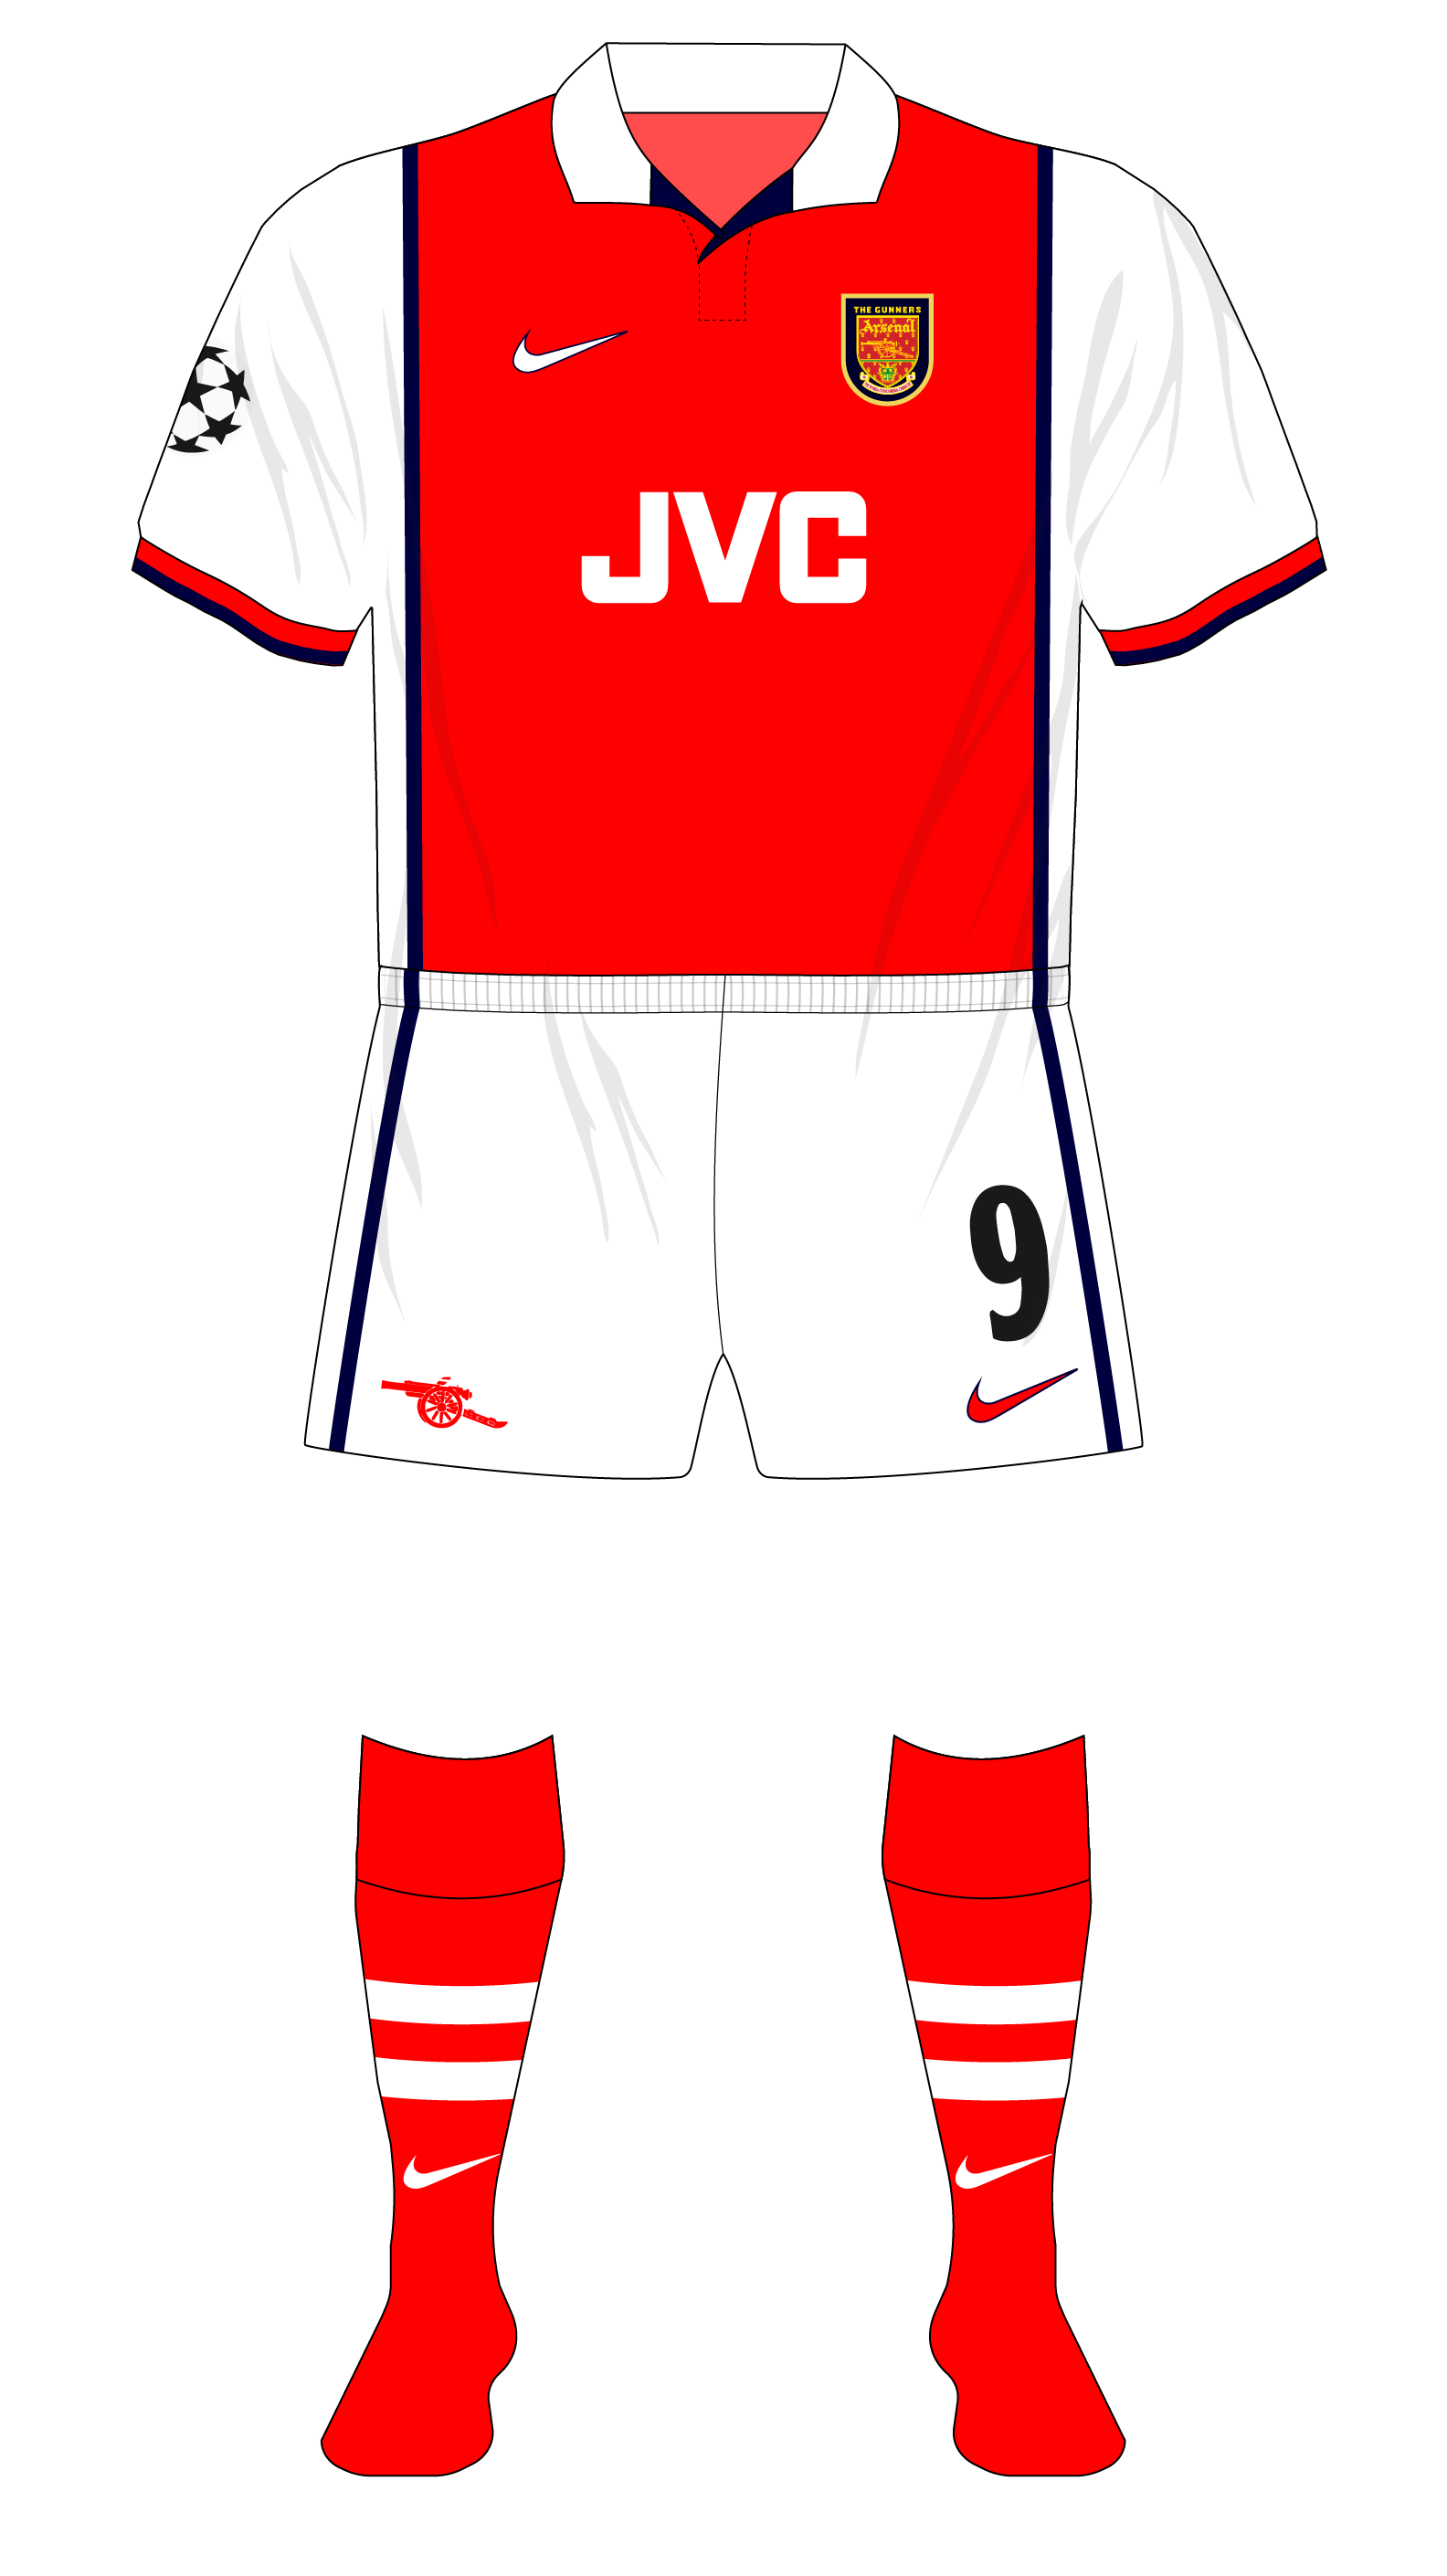 fe72959e560 Arsenal-1998-1999-Nike-home-kit-Panathinaikos-01 – Museum of Jerseys